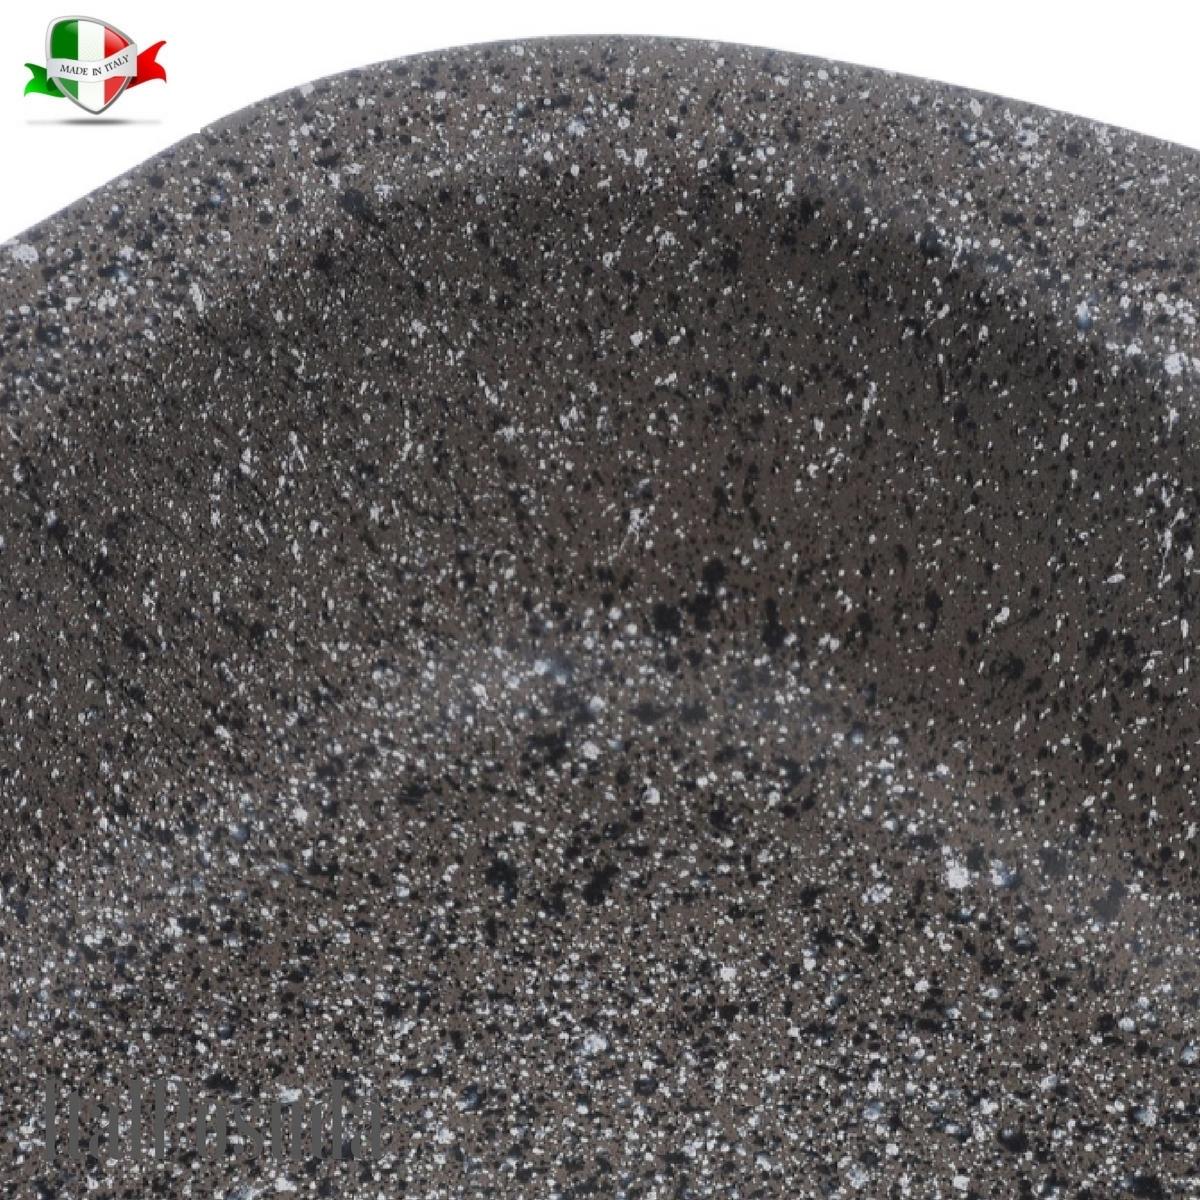 Противень Art Granit 31х23 см, высота 60мм